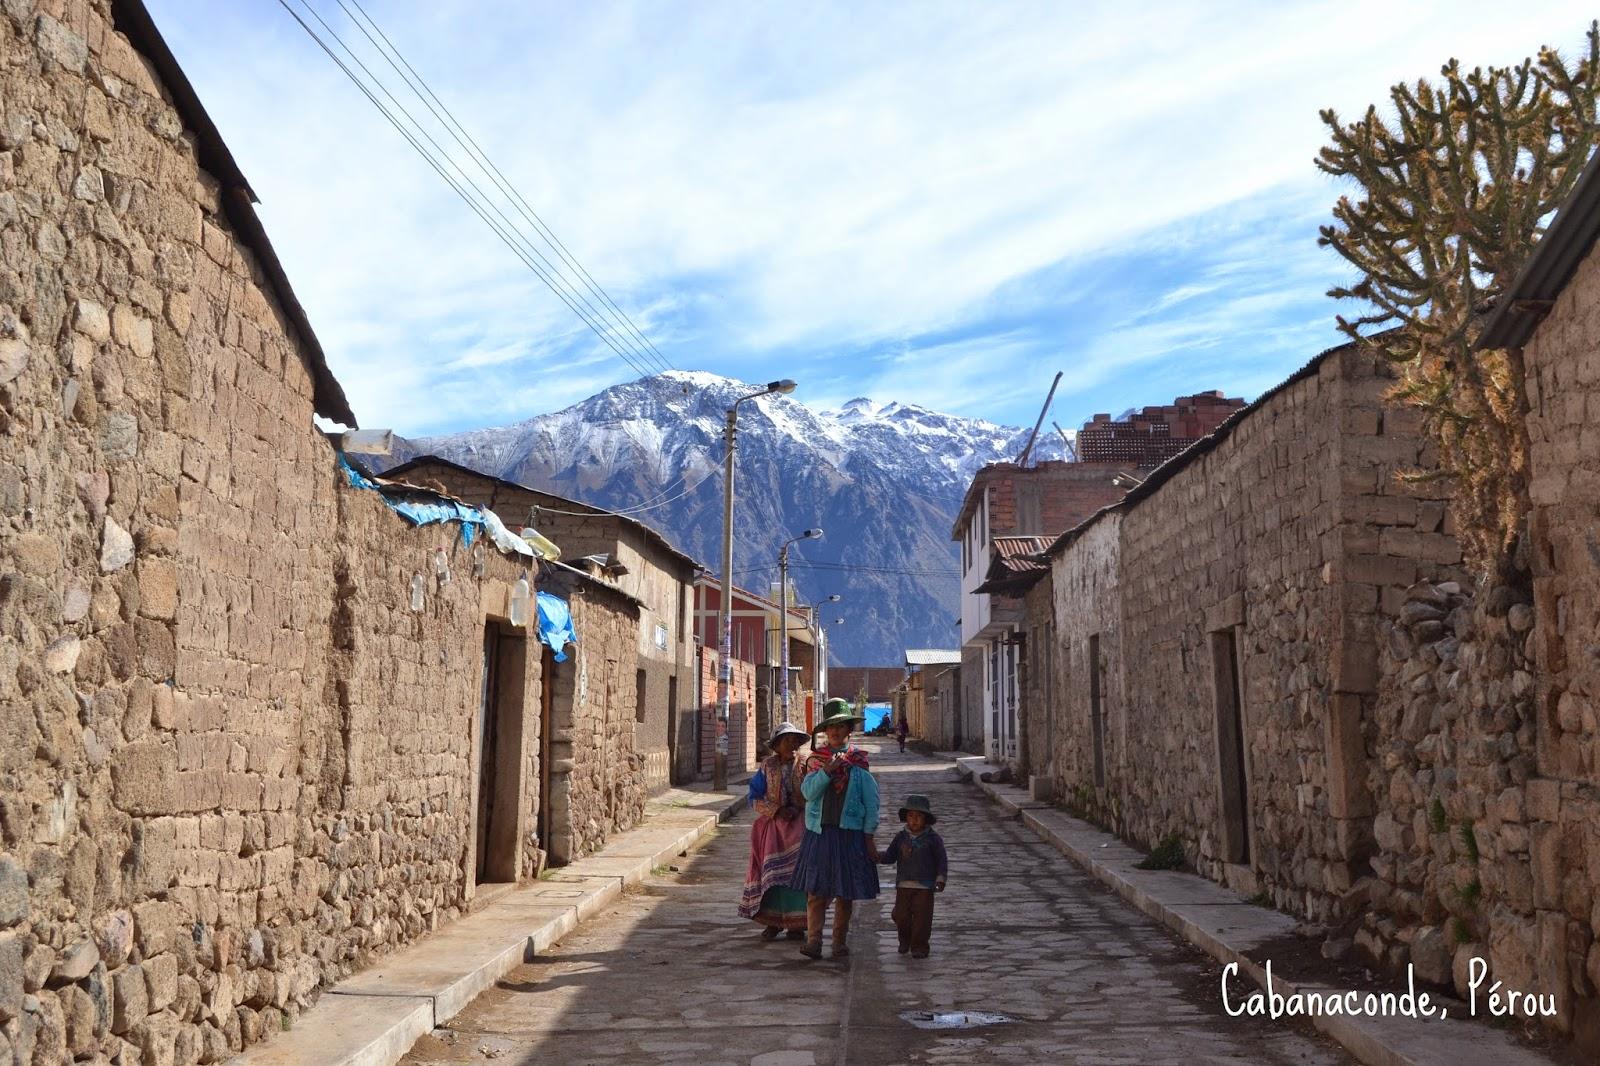 Cabanaconde - Pérou